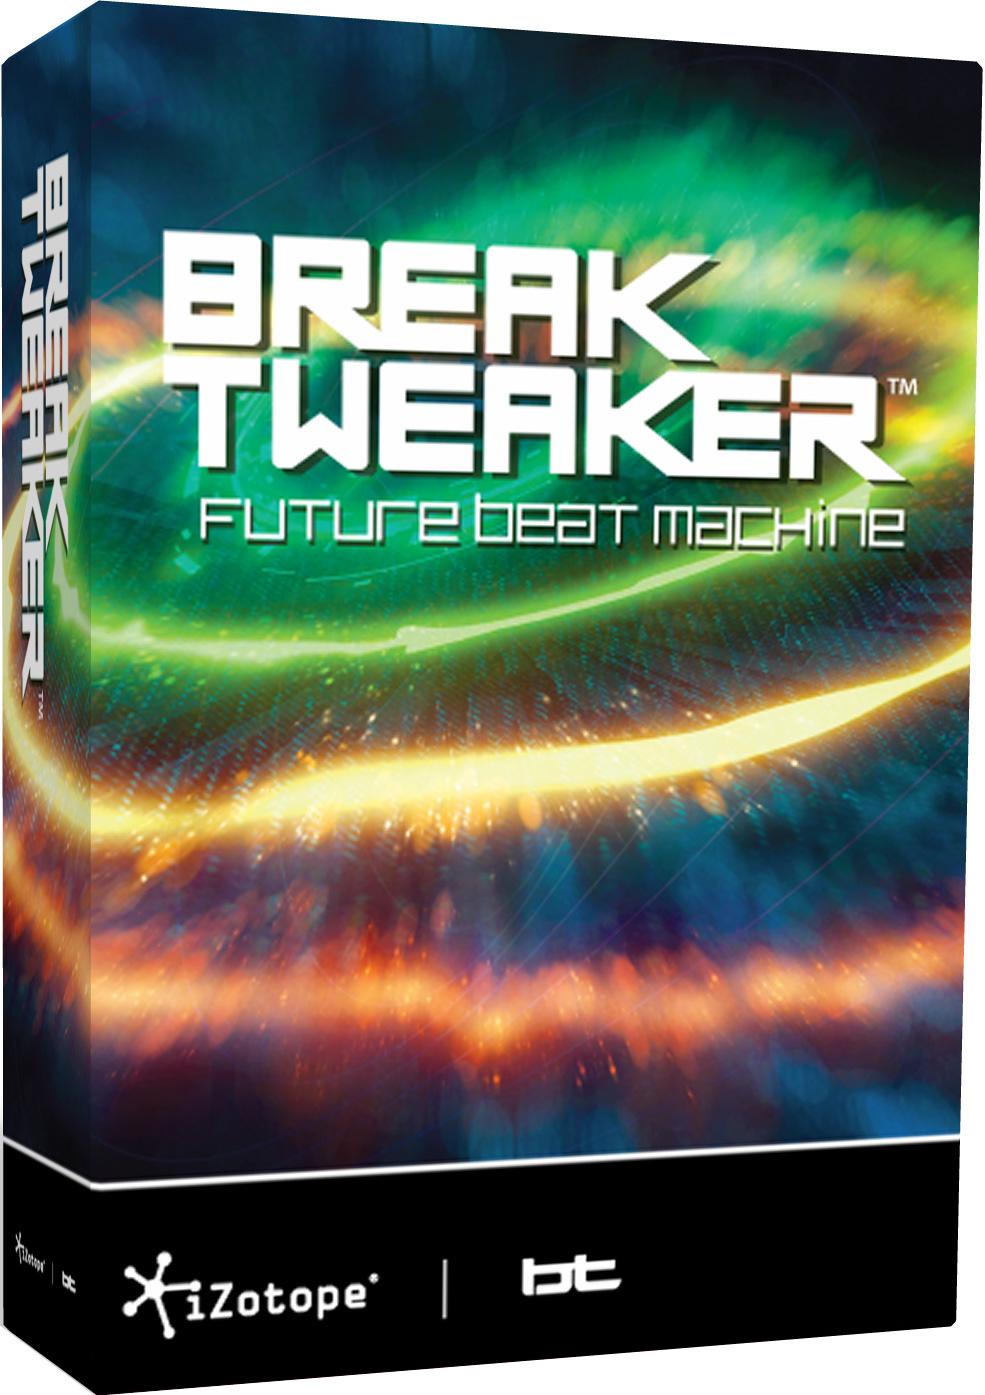 izotope_breaktweaker_box_crop